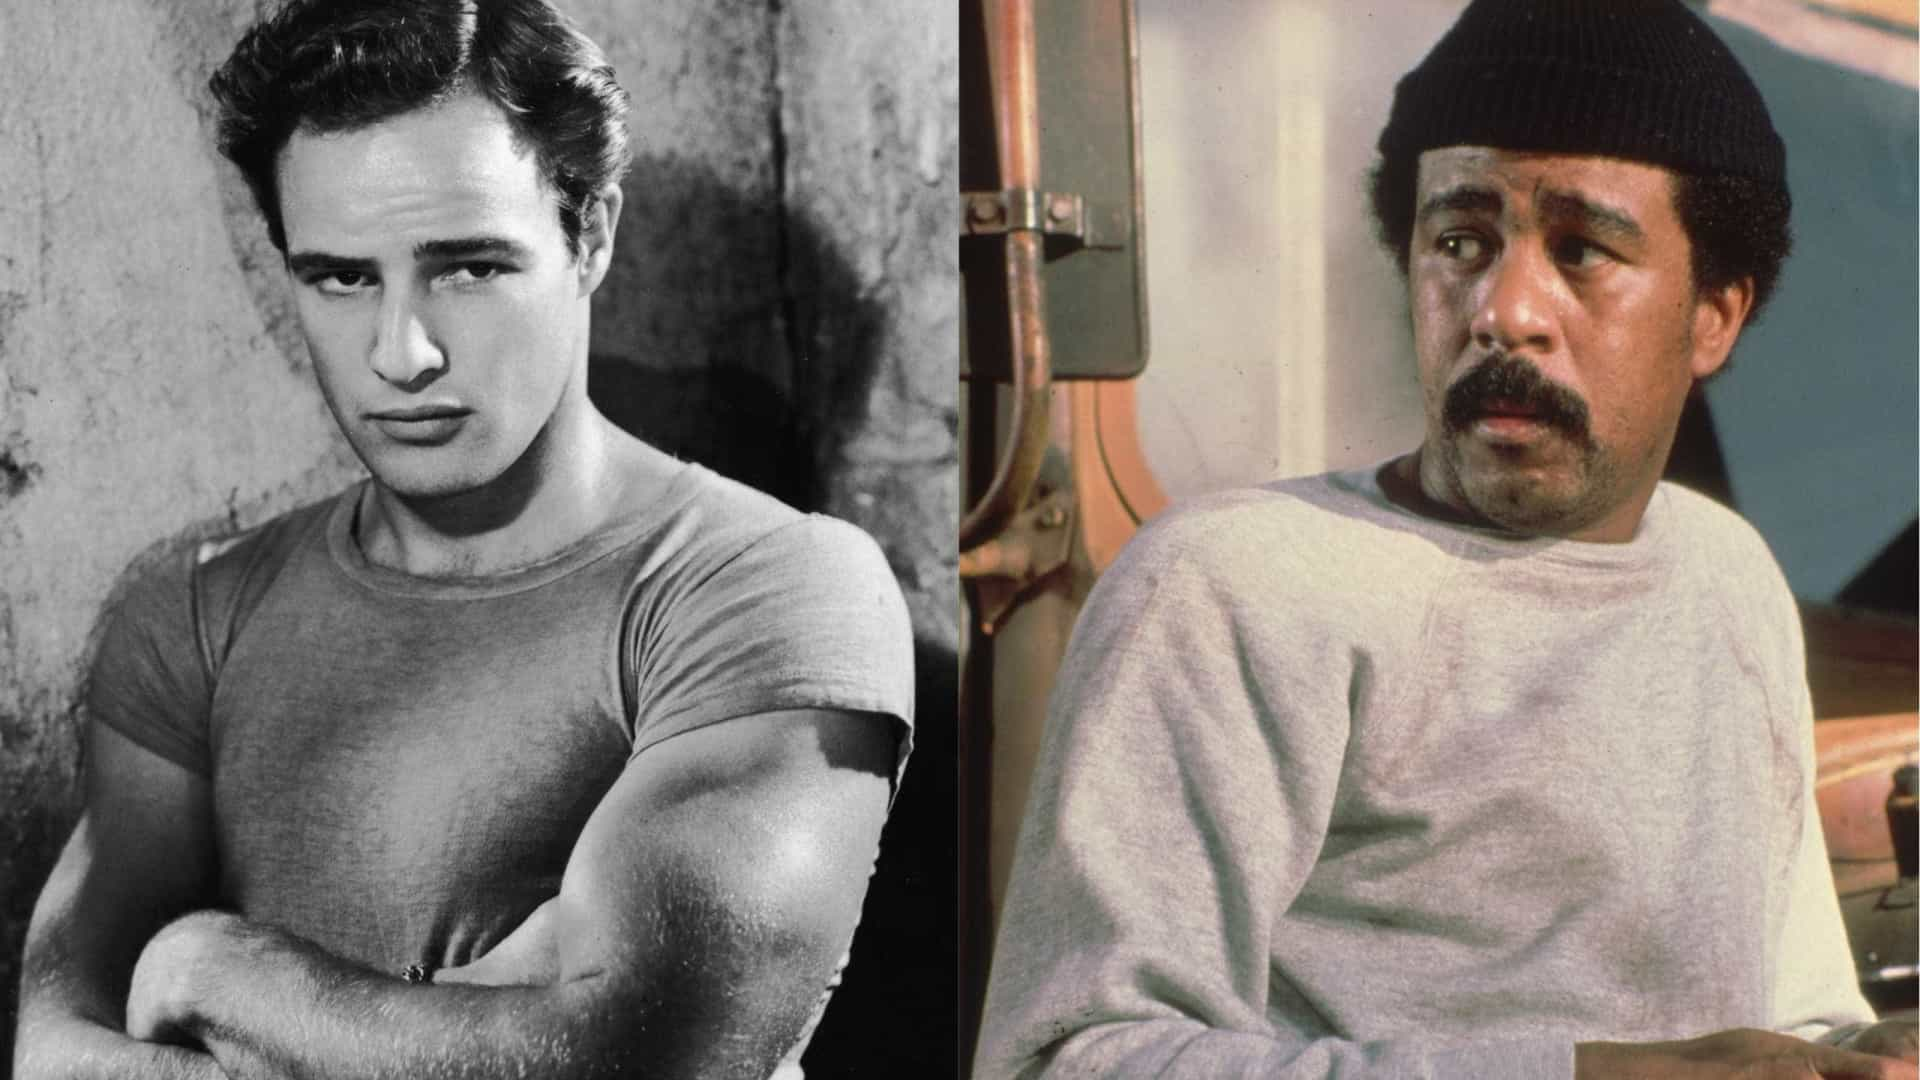 Viúva de Richard Pryor confirma romance do ator com Marlon Brando